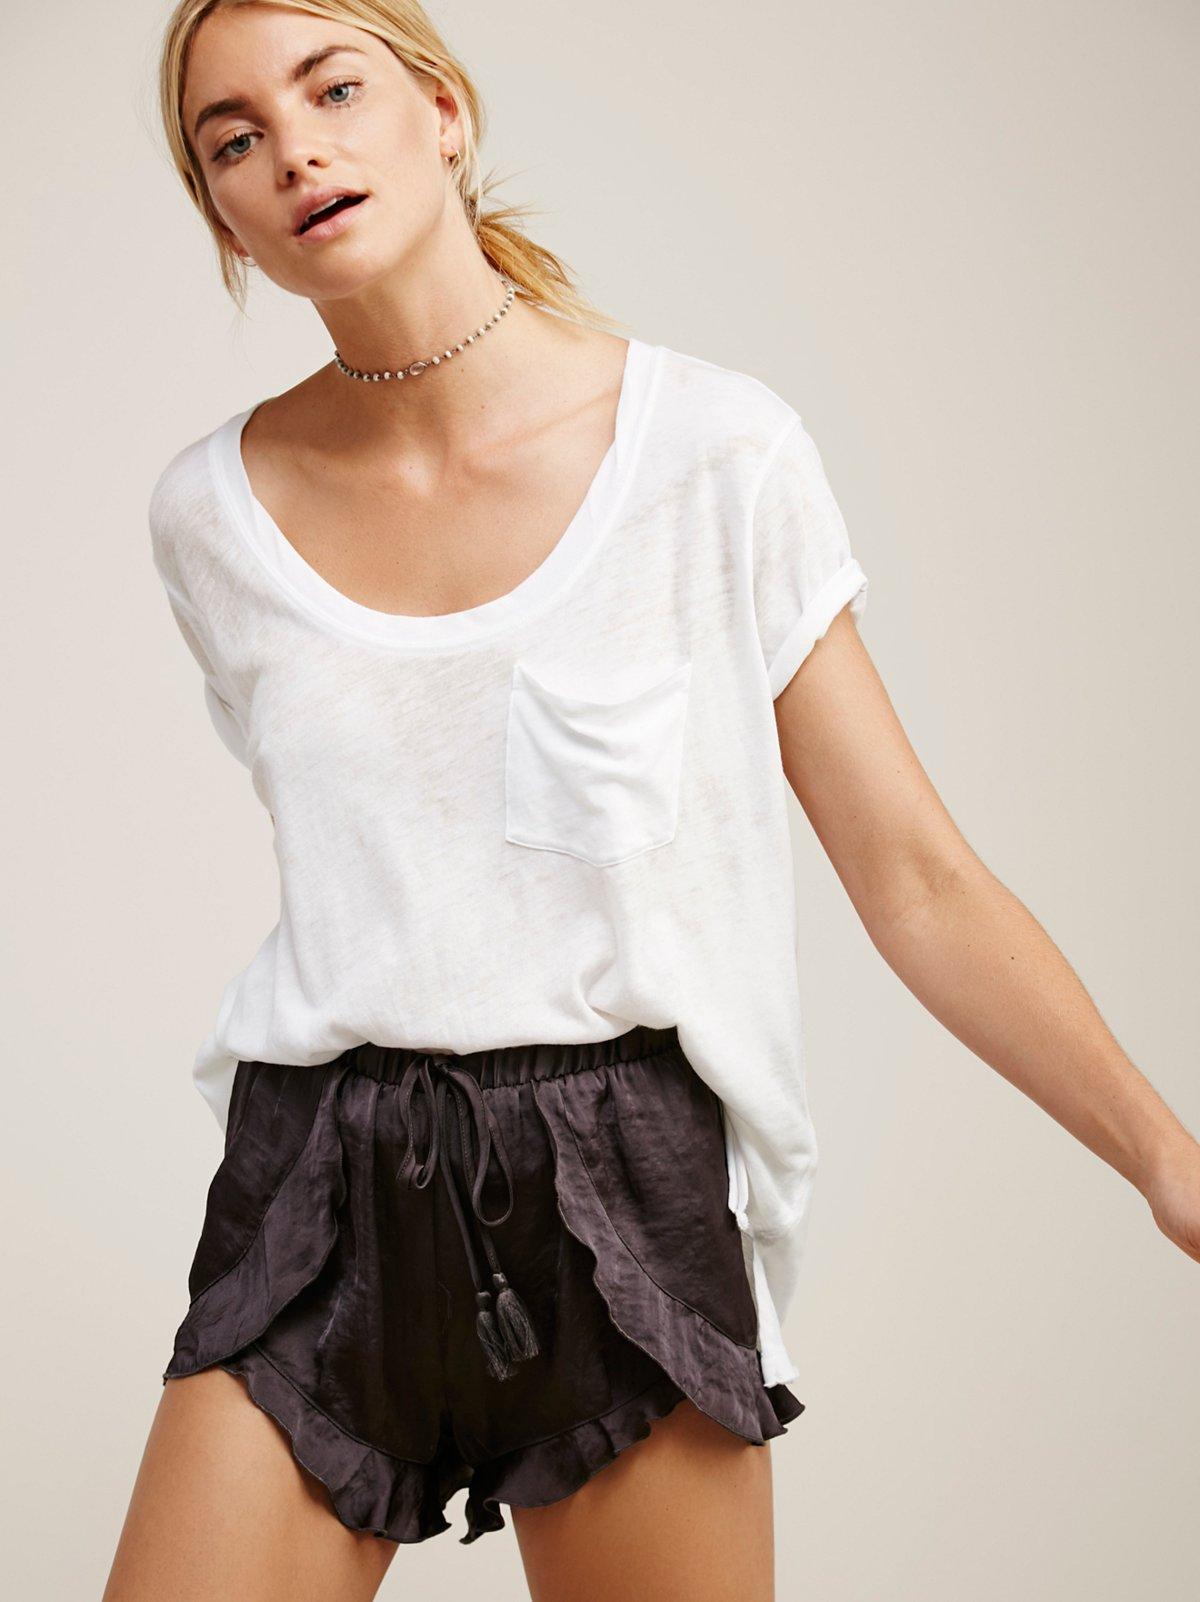 Cascading Petal短裤